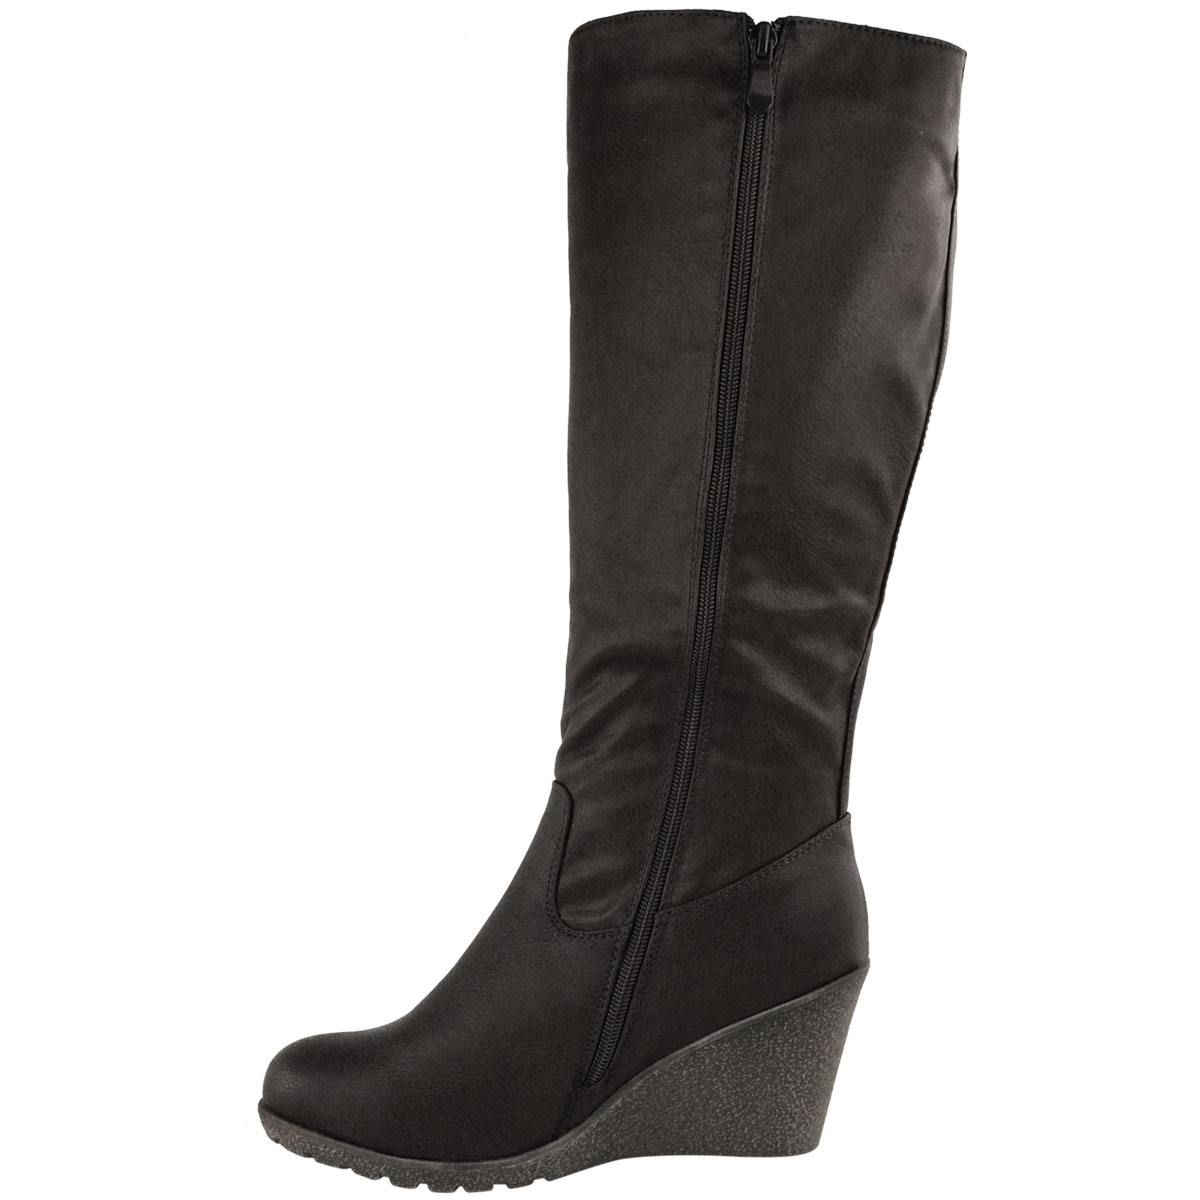 Womens-Ladies-Wedge-Low-Heel-Winter-Knee-Boots-Warm-Faux-Fur-Fleece-Size-UK thumbnail 14